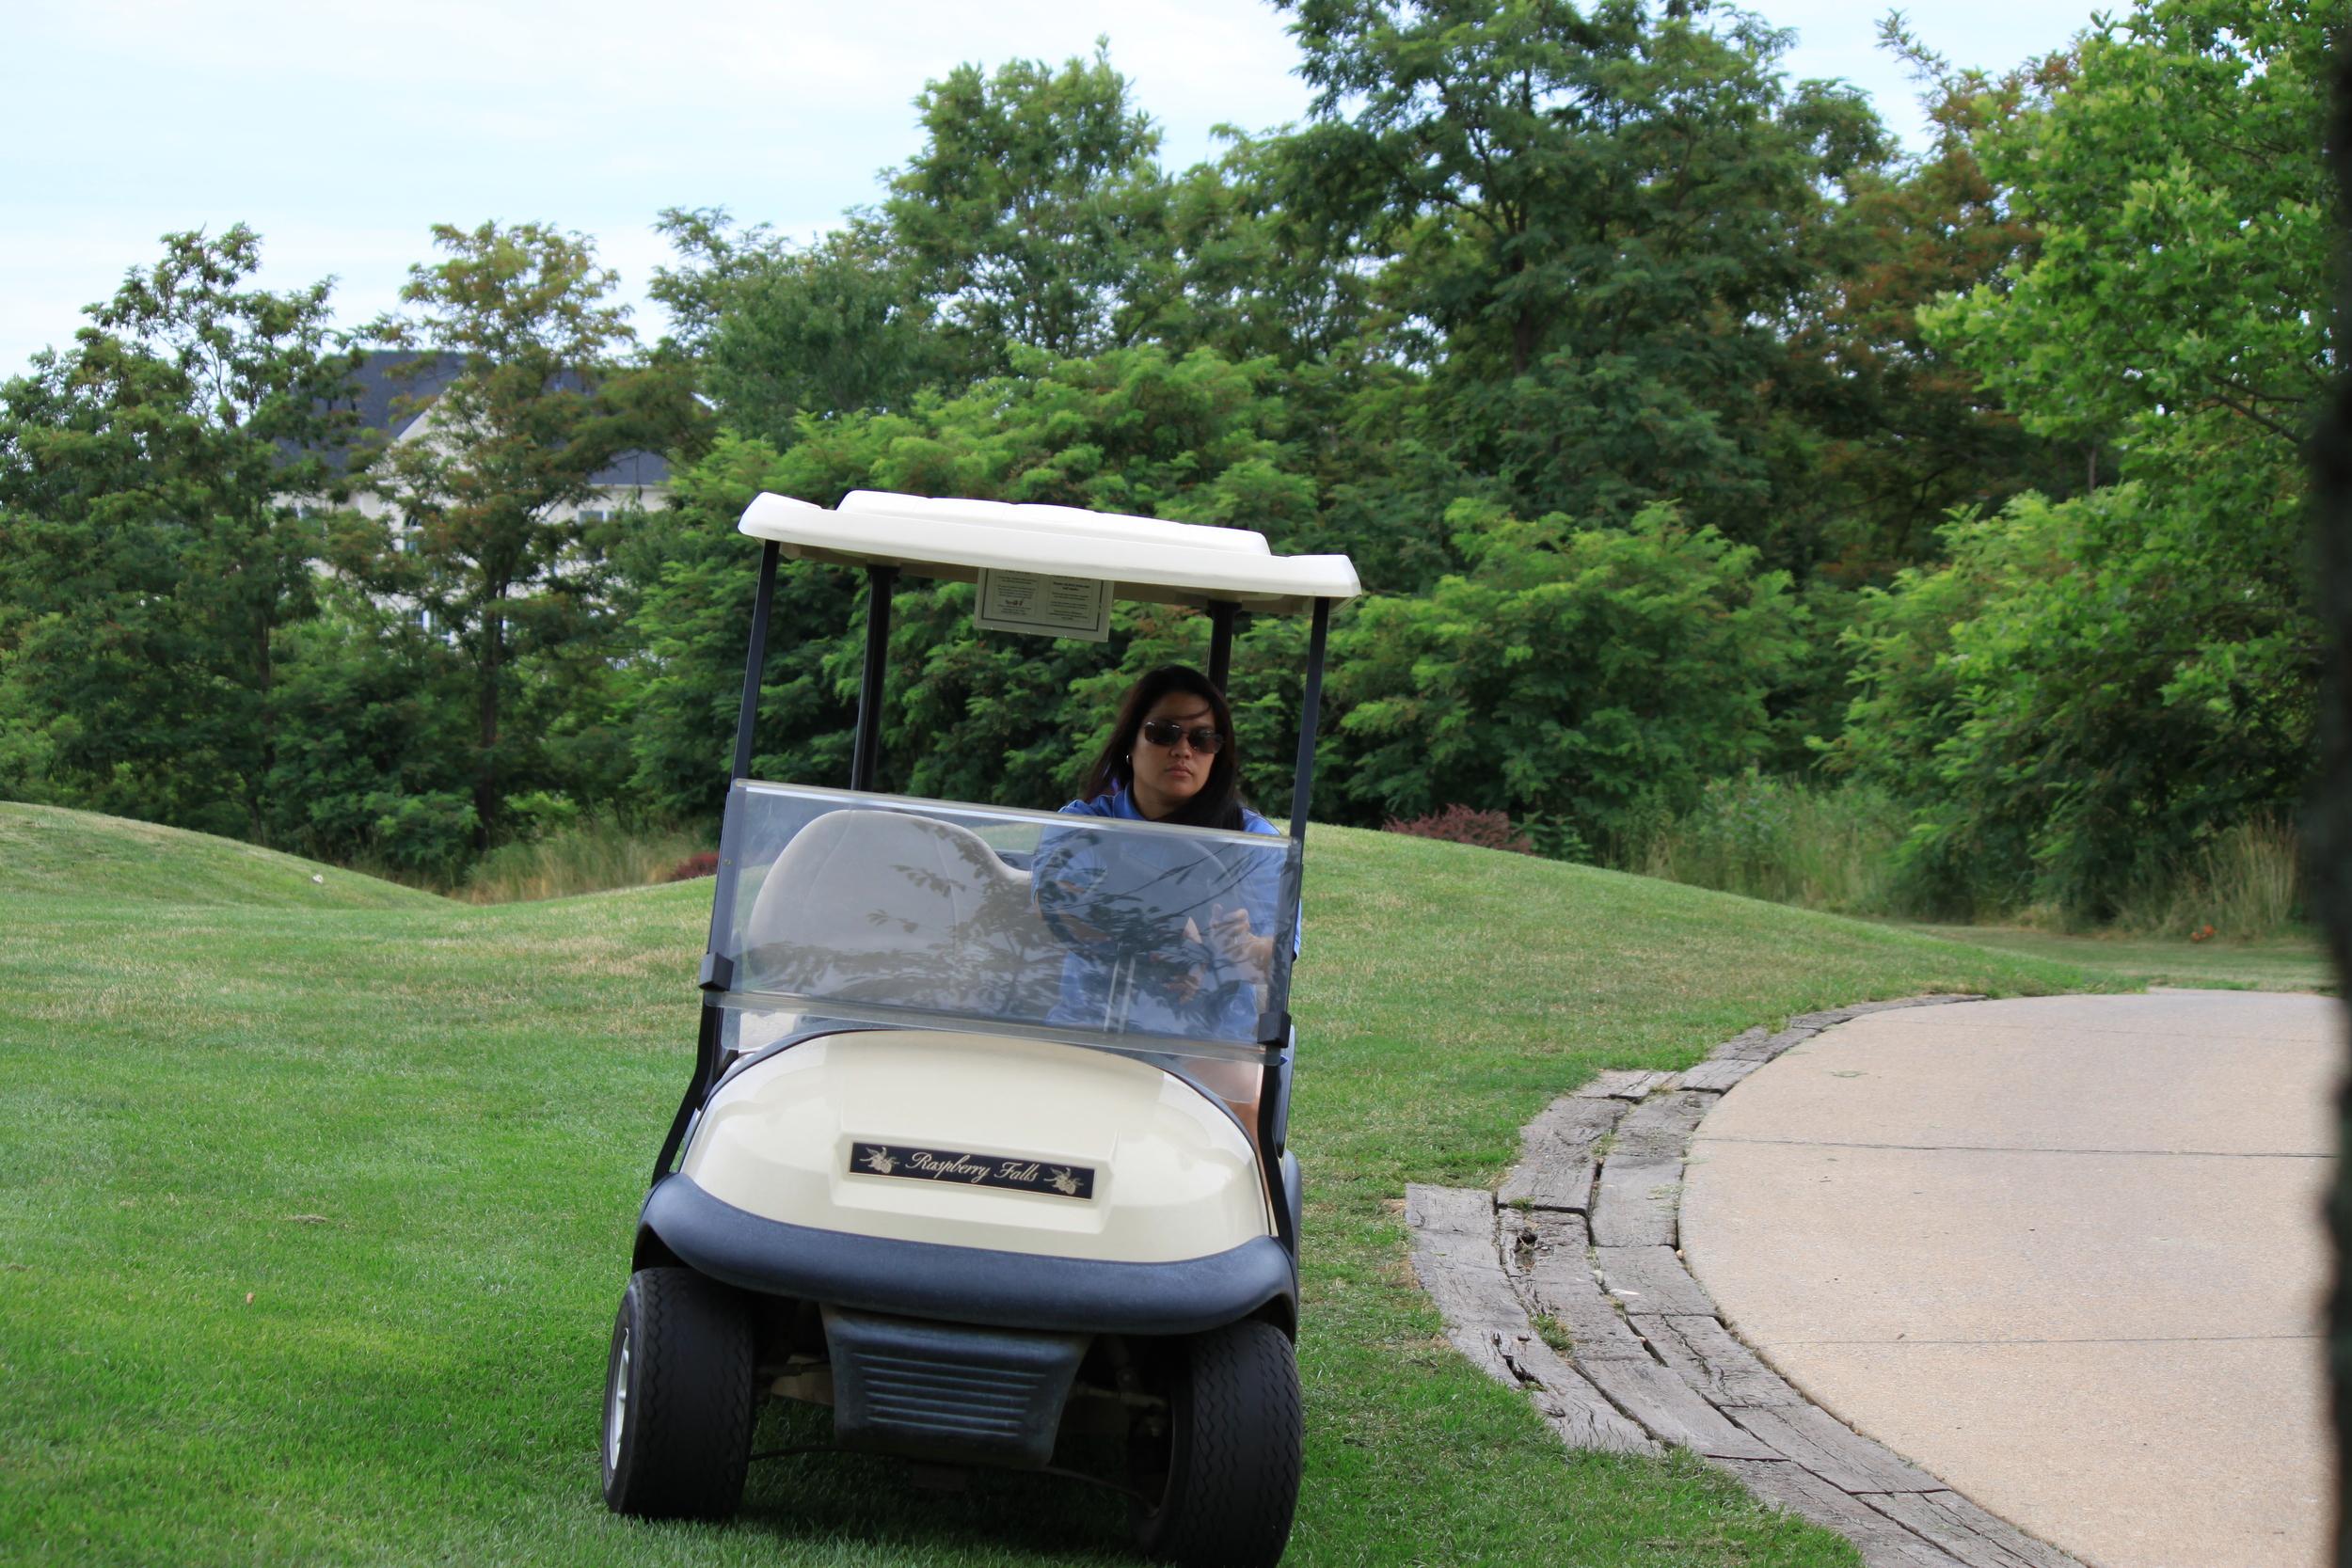 Dennis_Fitzgerald_Golf_Tournament_2011_IMG_3748.JPG